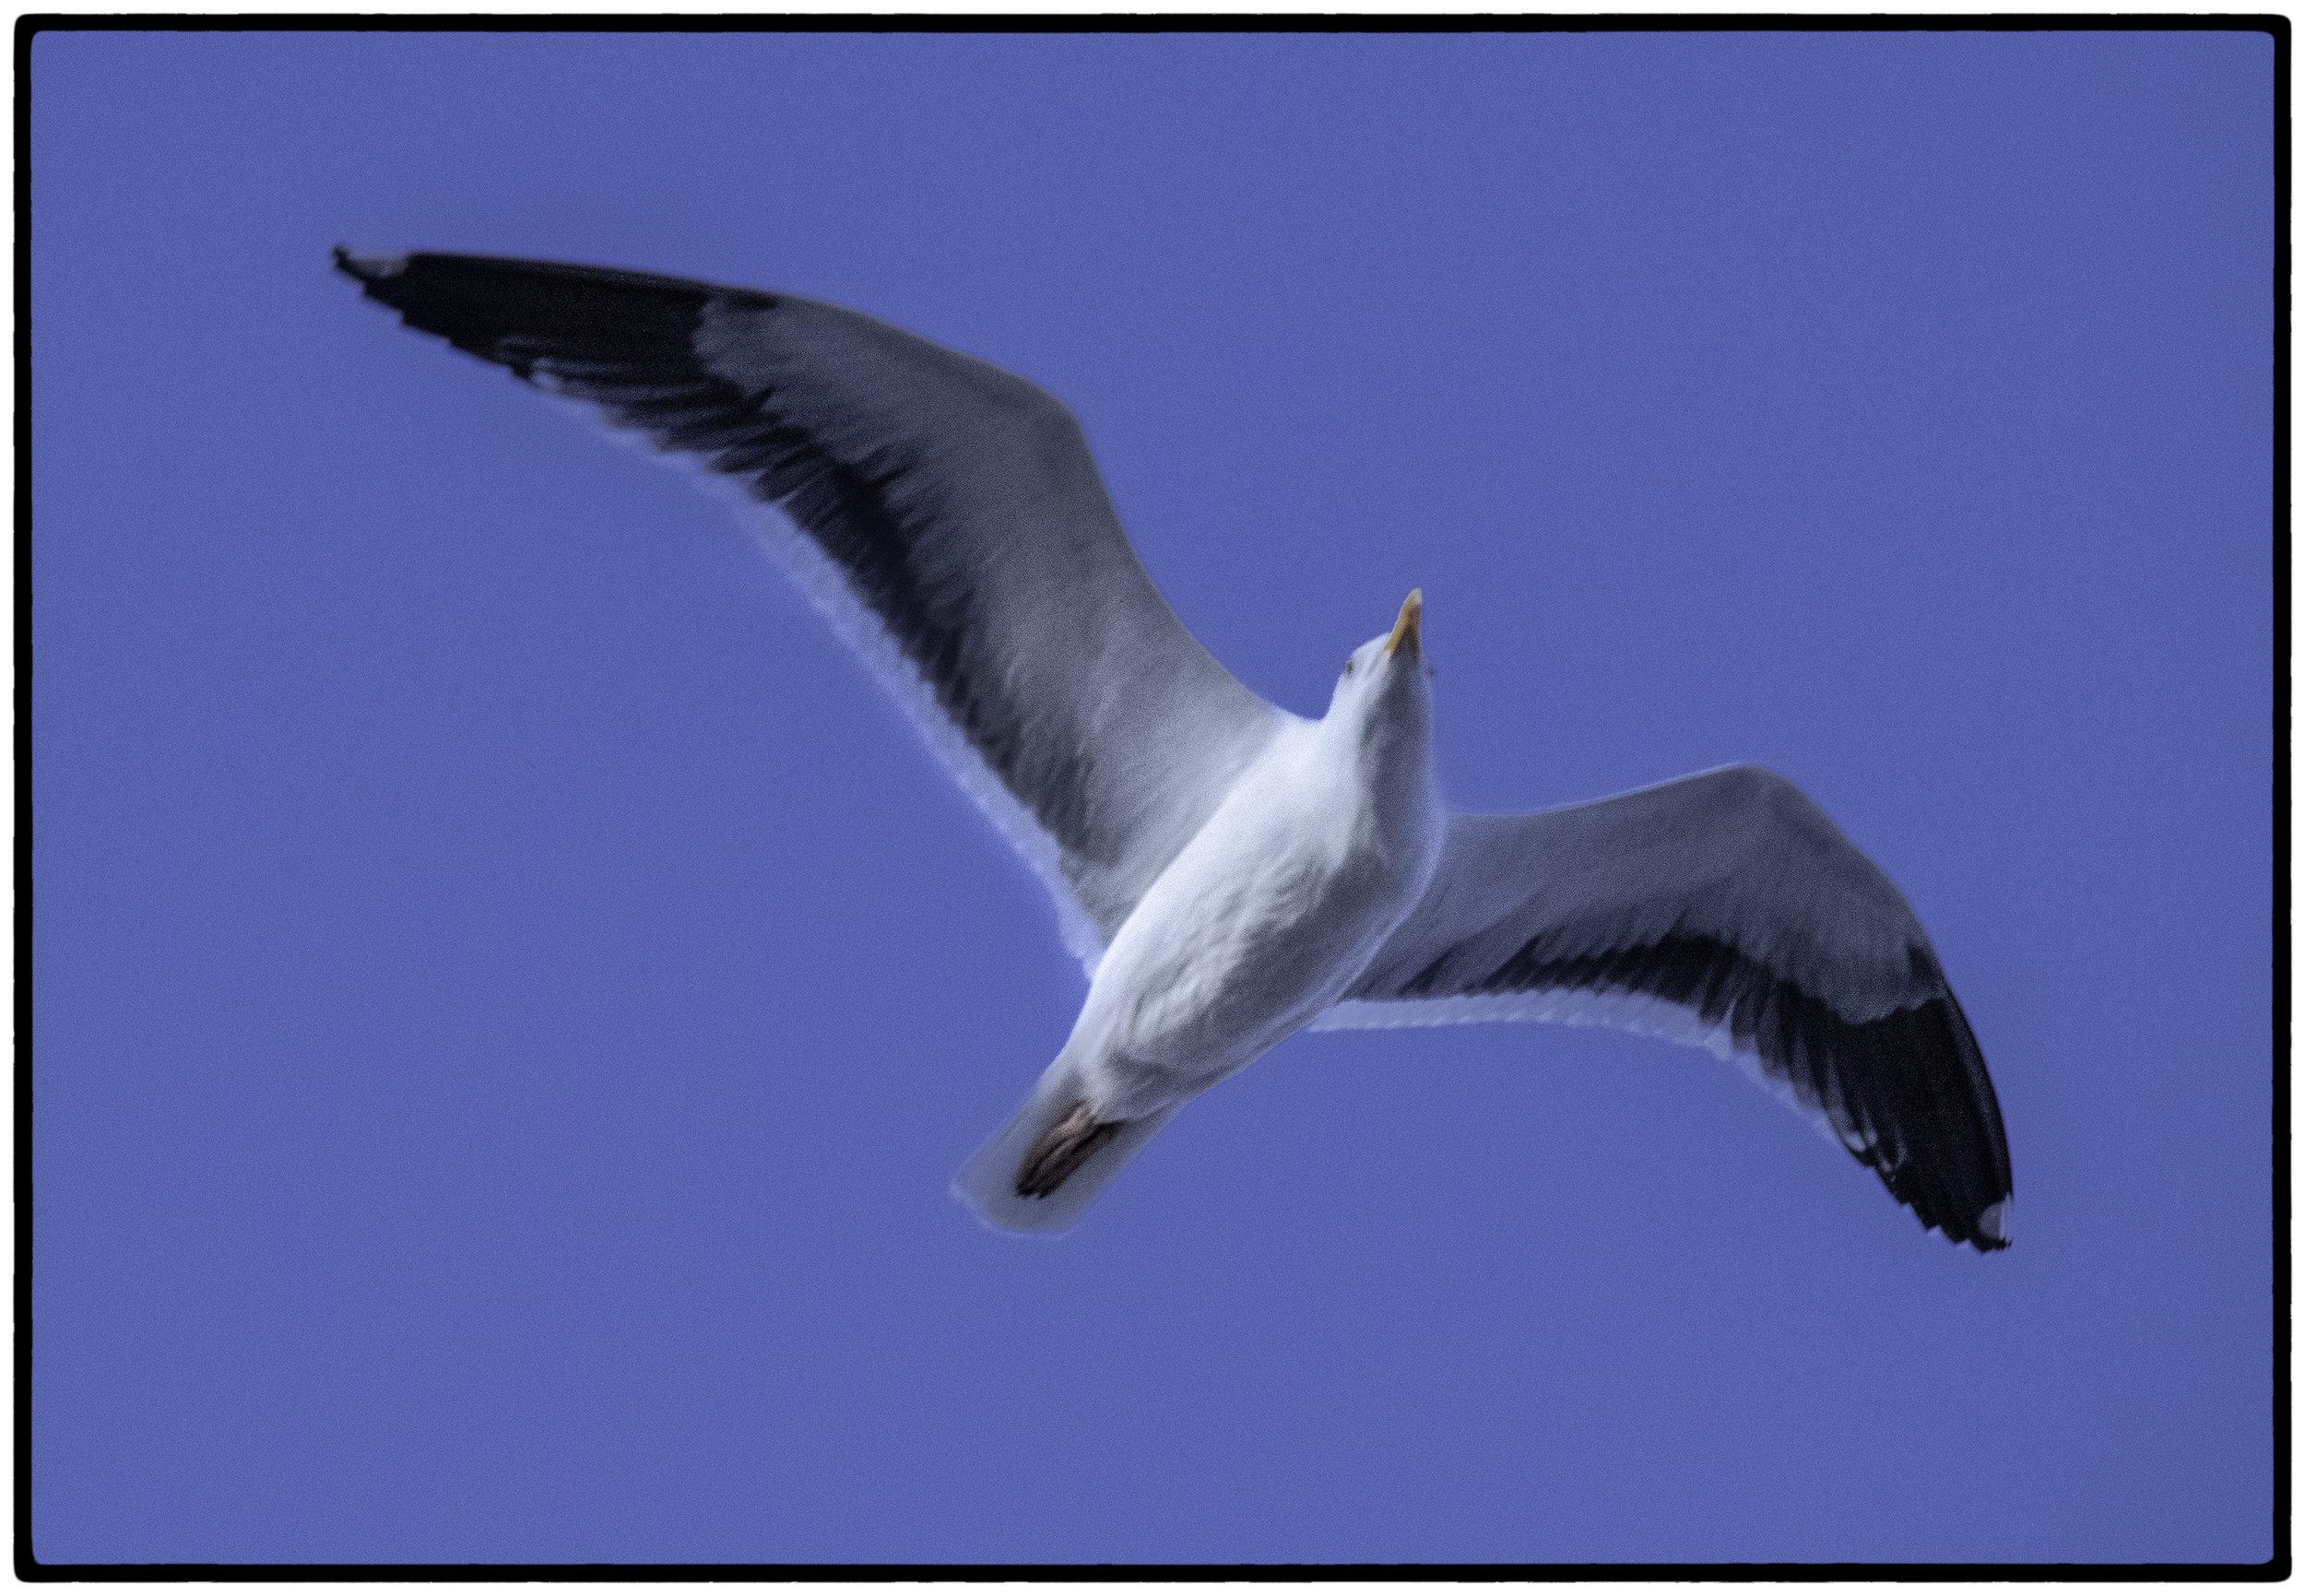 Gull, Asilomar Beach